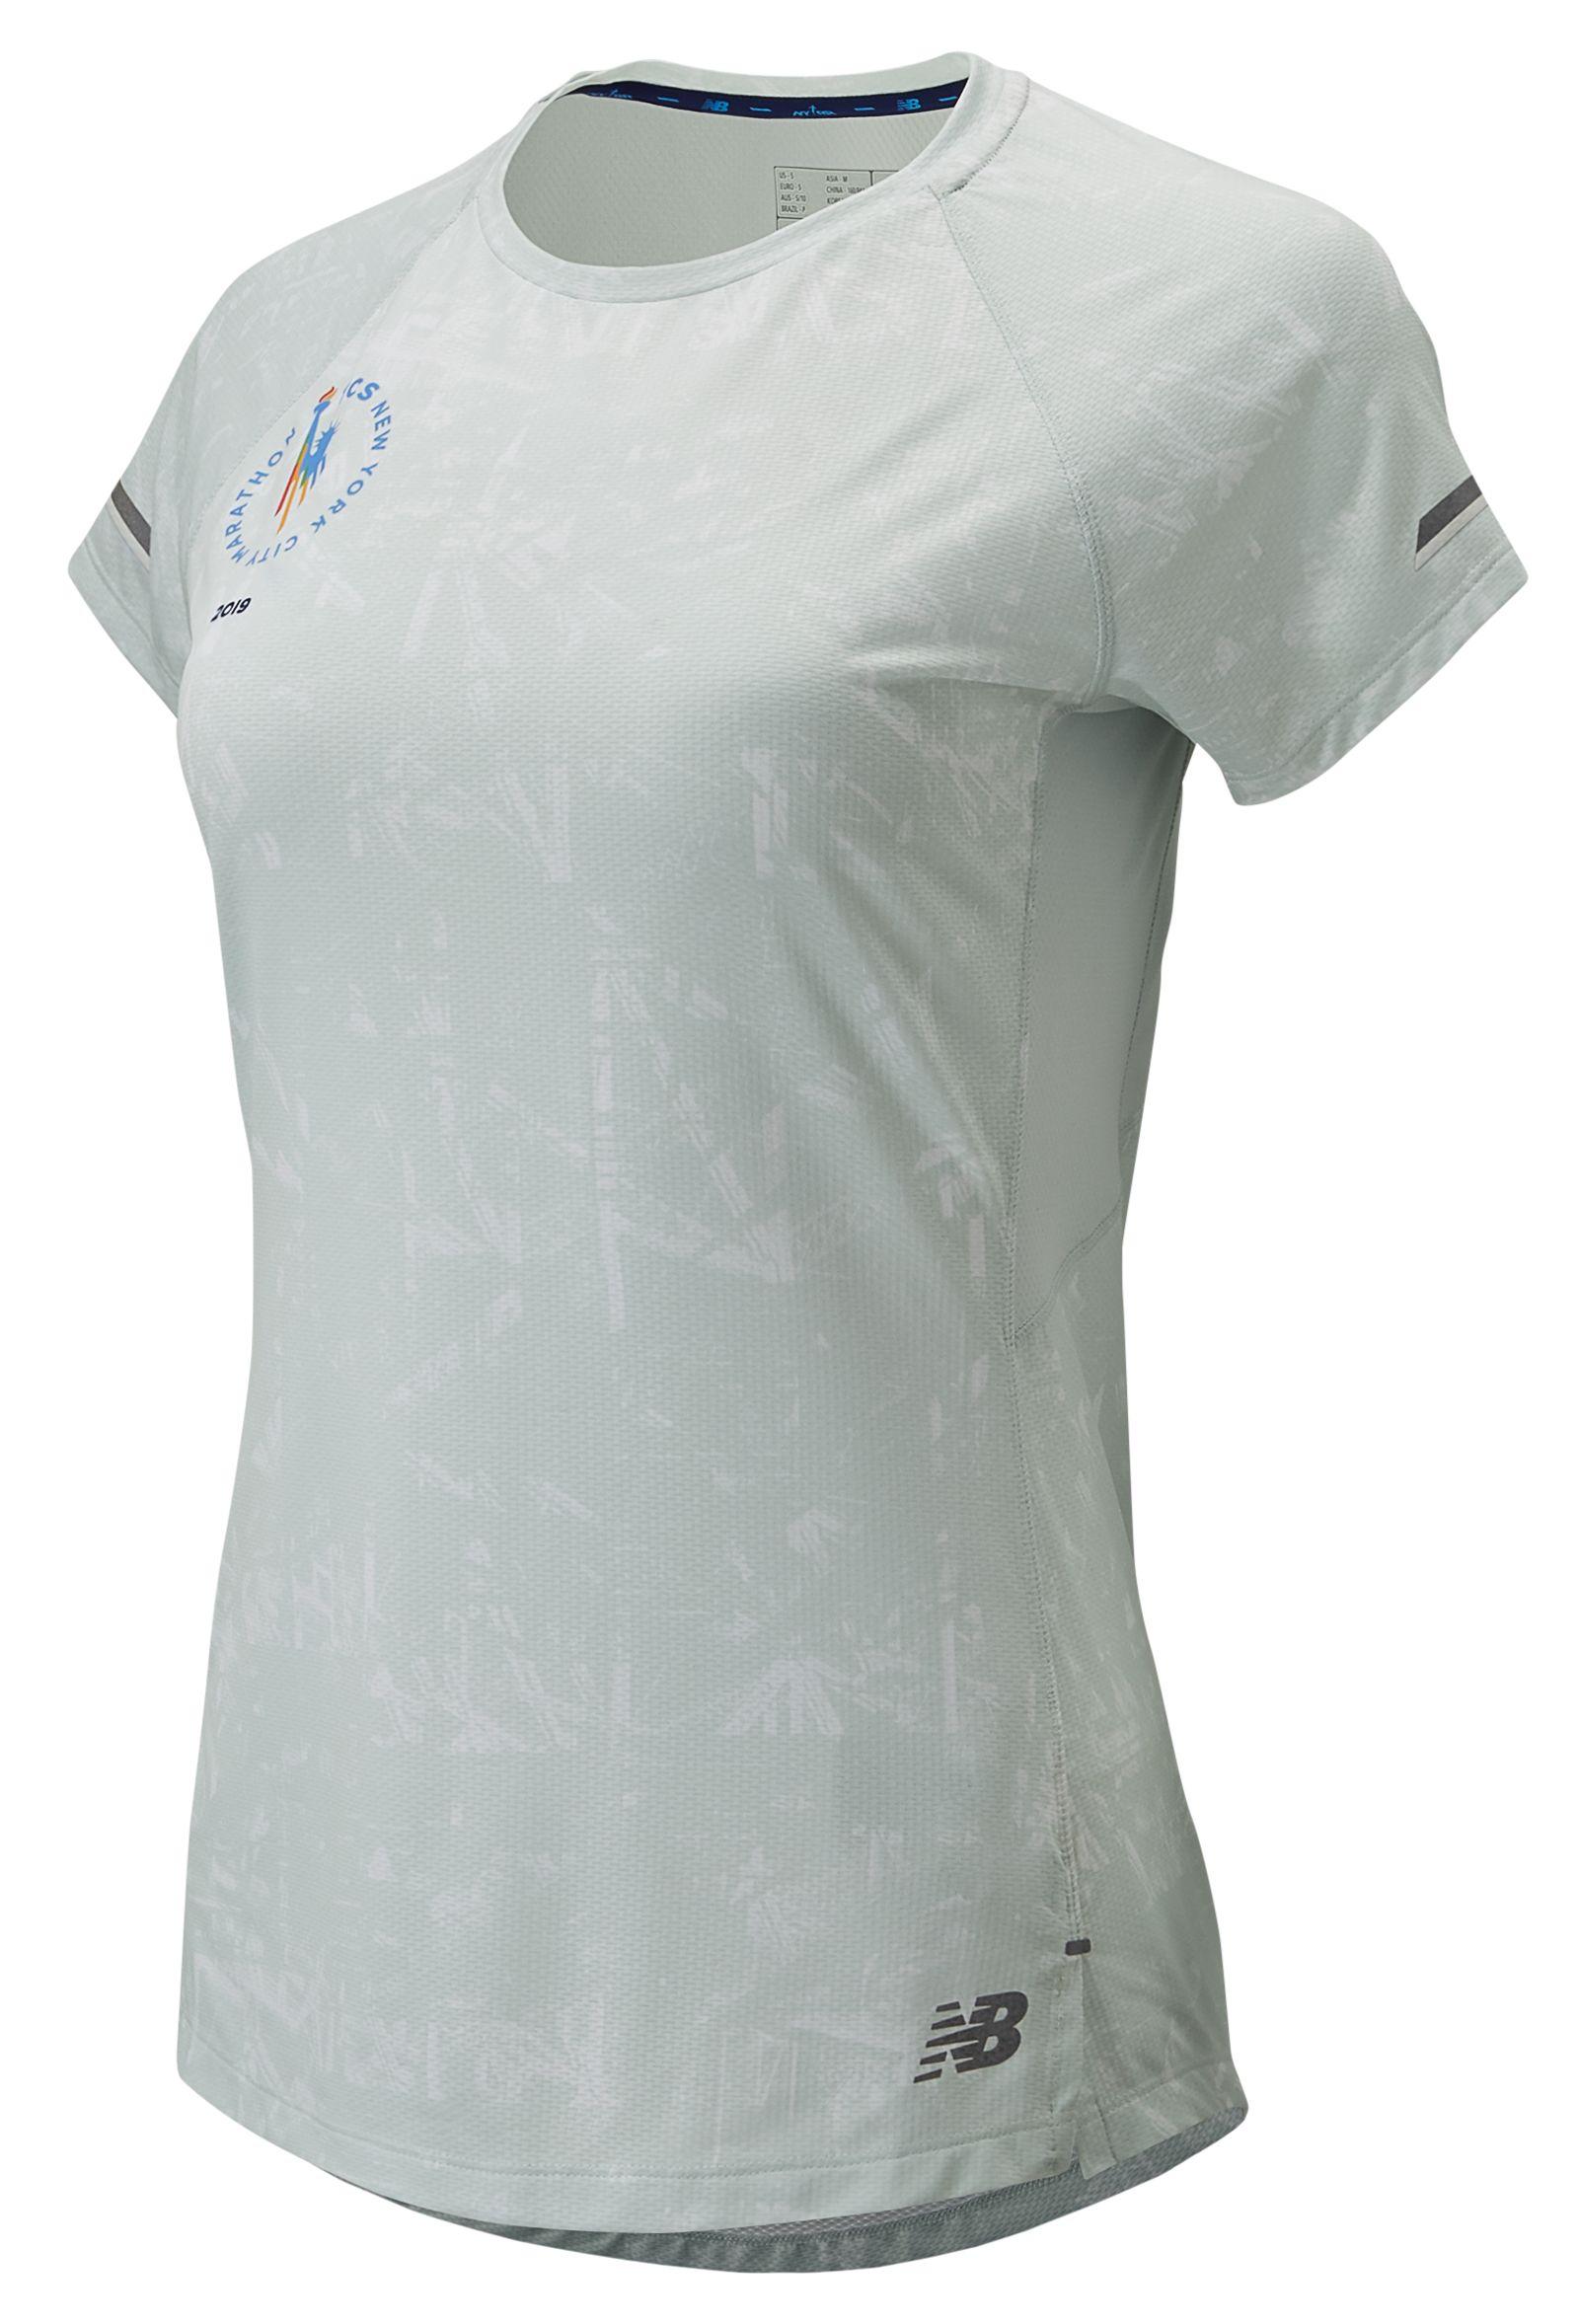 Women's 2019 NYC Marathon Printed NB ICE 2.0 Short Sleeve